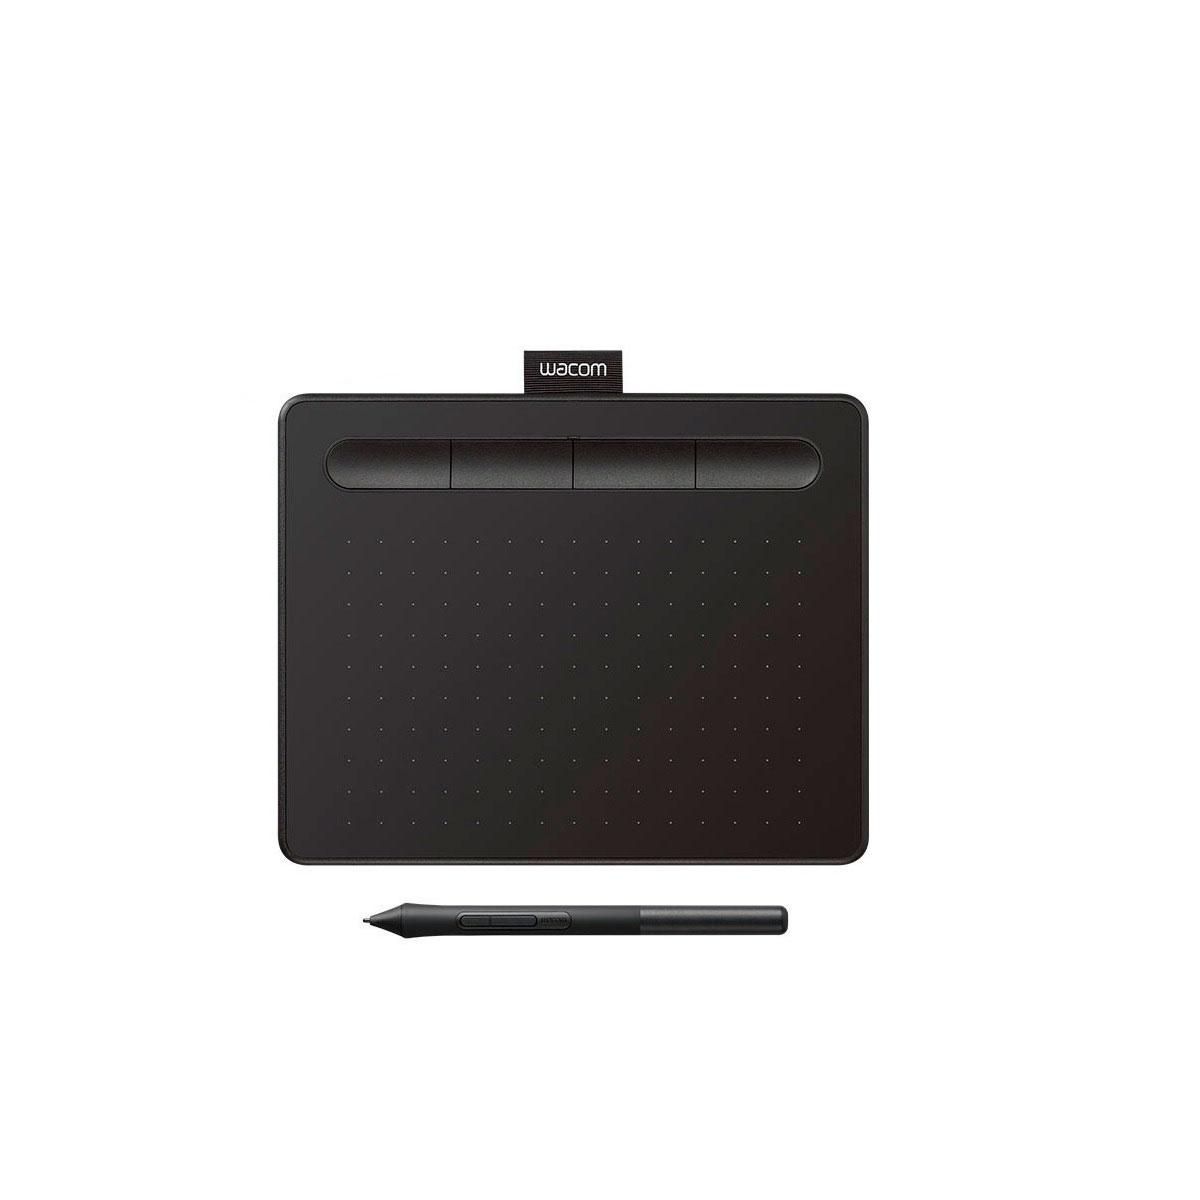 CTL4100 WACOM                                                        | TABLETA INTUOS BASIC PEN SMALL BLACK, 200 X 160 X 8.8 MM, 4096 NIVELES DE PRESIÓN - 2540 LPI